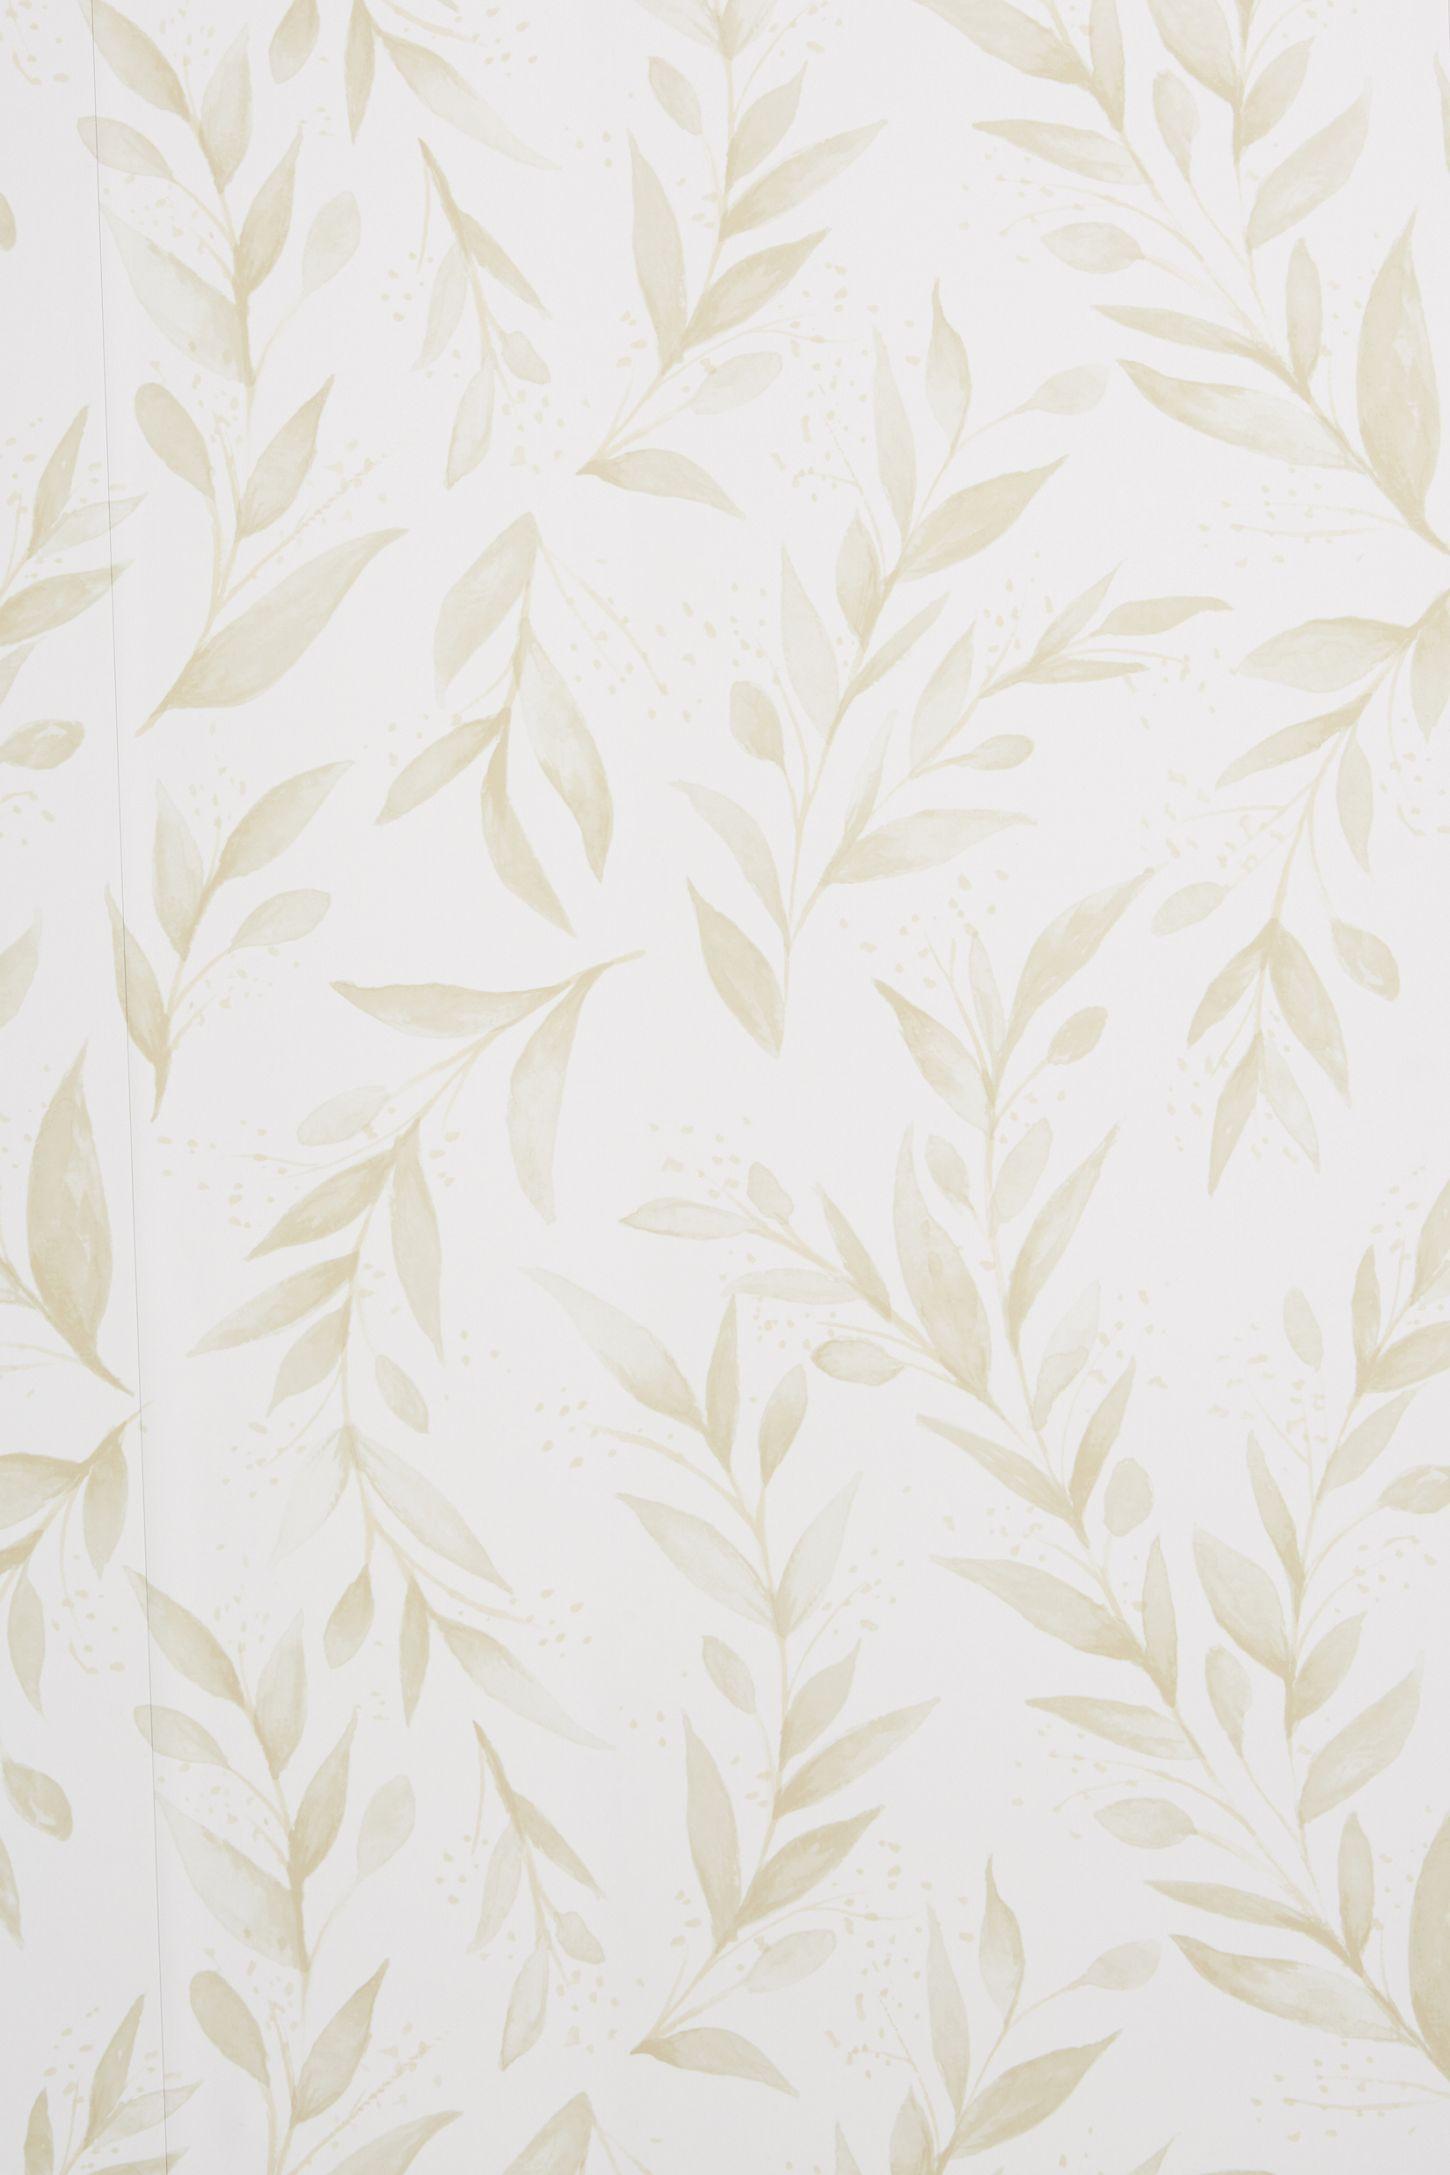 Magnolia Home Olive Branch Wallpaper Beige wallpaper